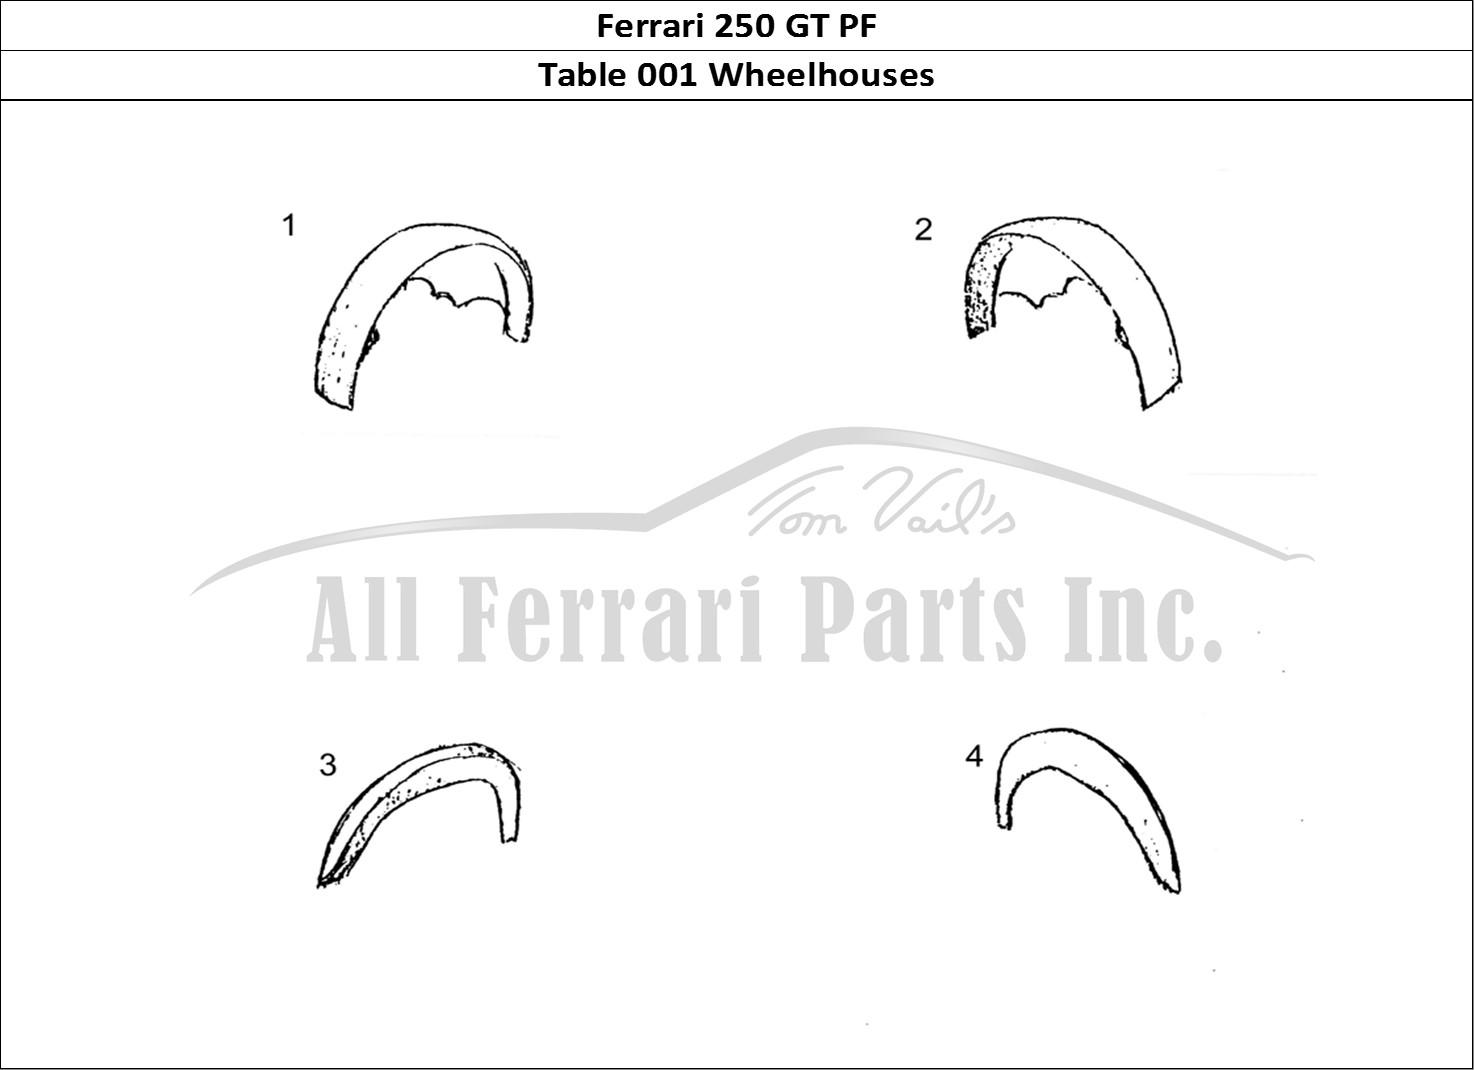 Buy original Ferrari 250 GT PF 001 Wheelhouses Ferrari